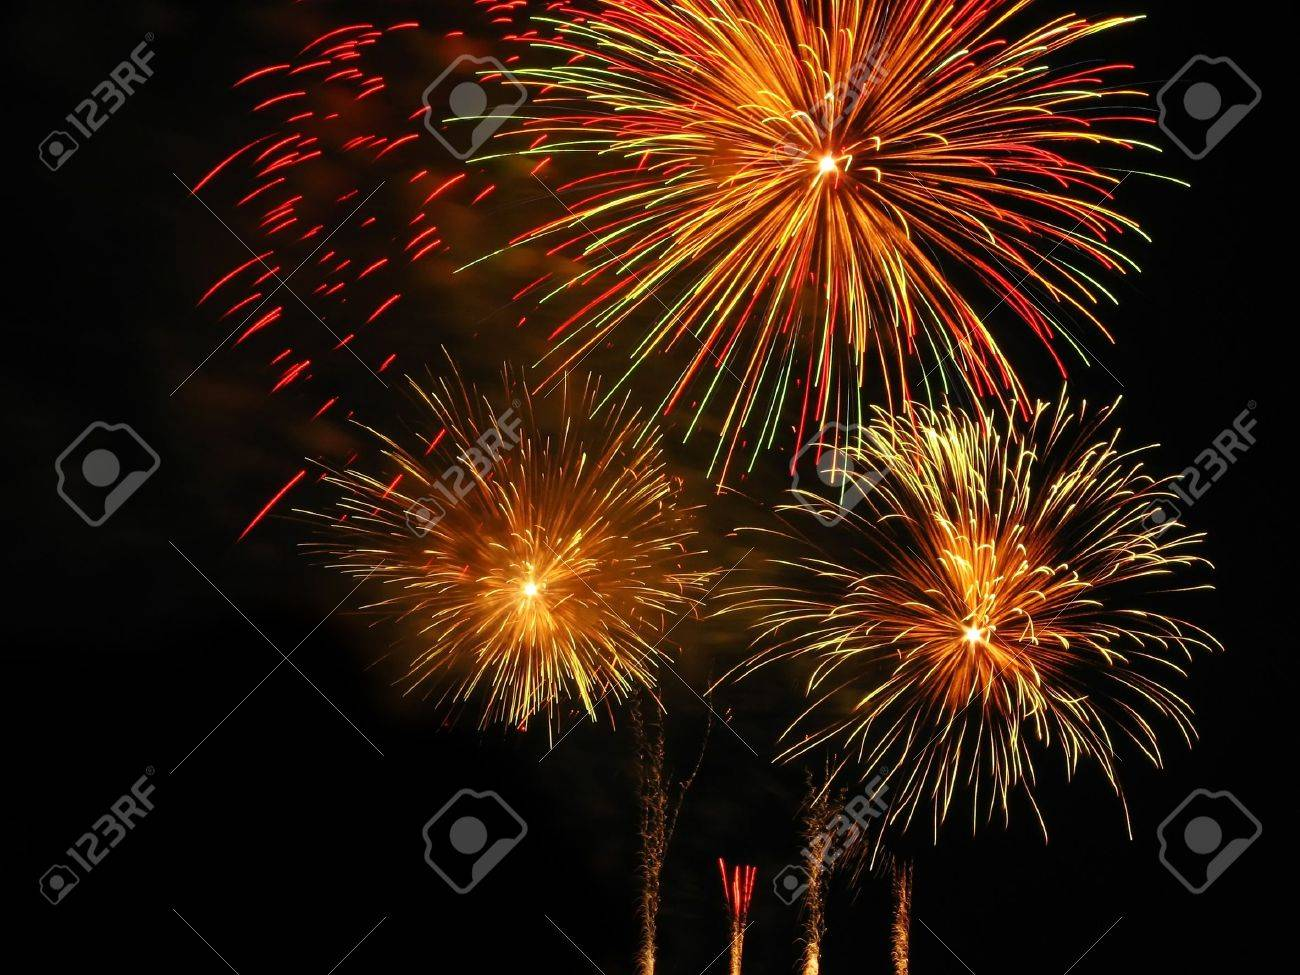 Colorful fireworks over dark sky, displayed during Barcelona Patron Saint La Merce (24th of september) - 9838771